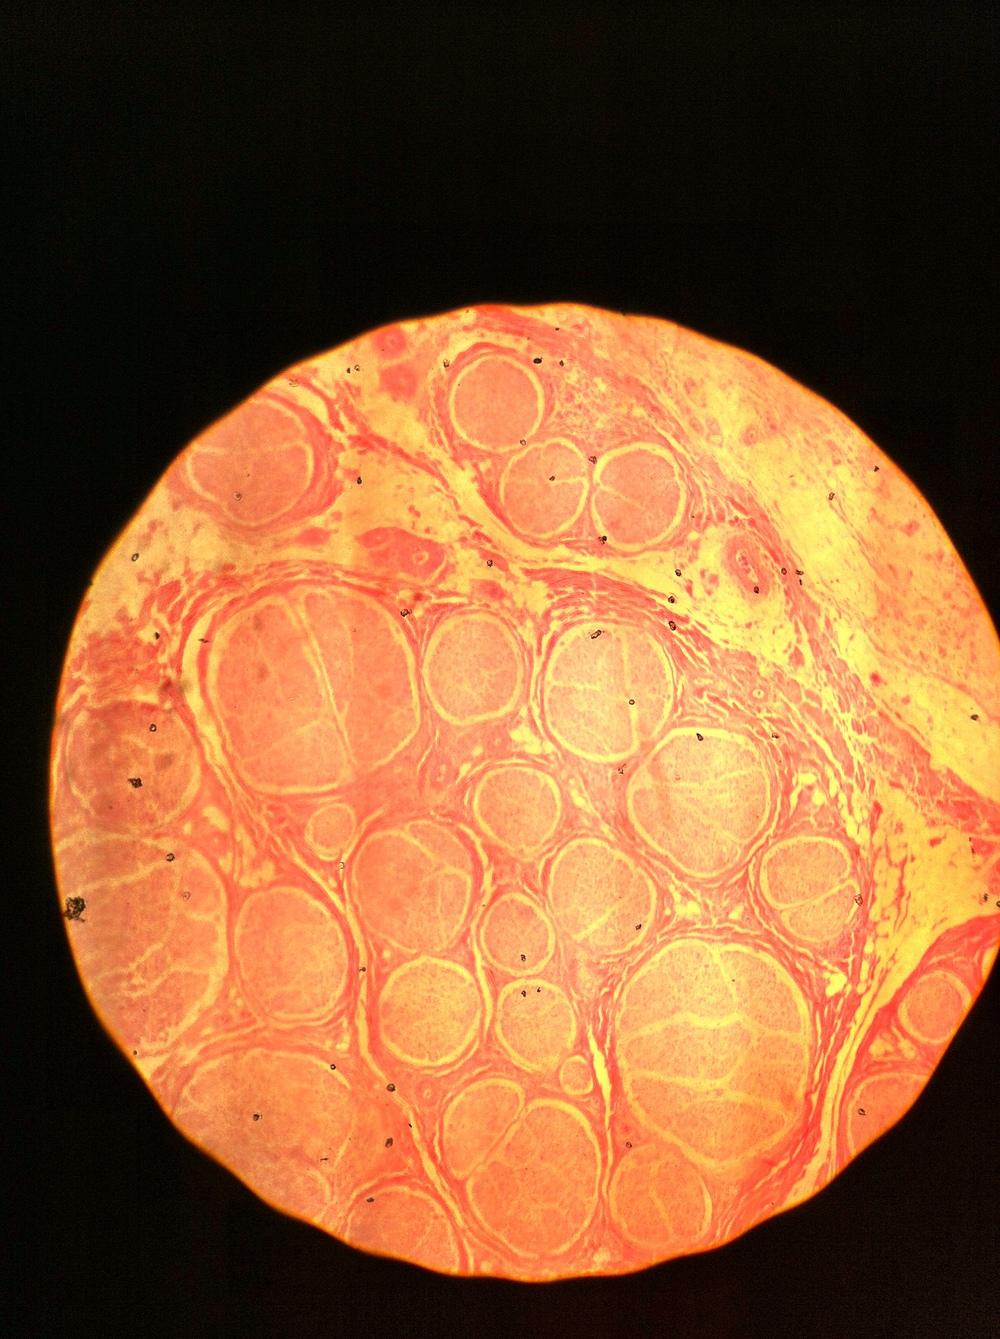 Neuron (cs) 40X